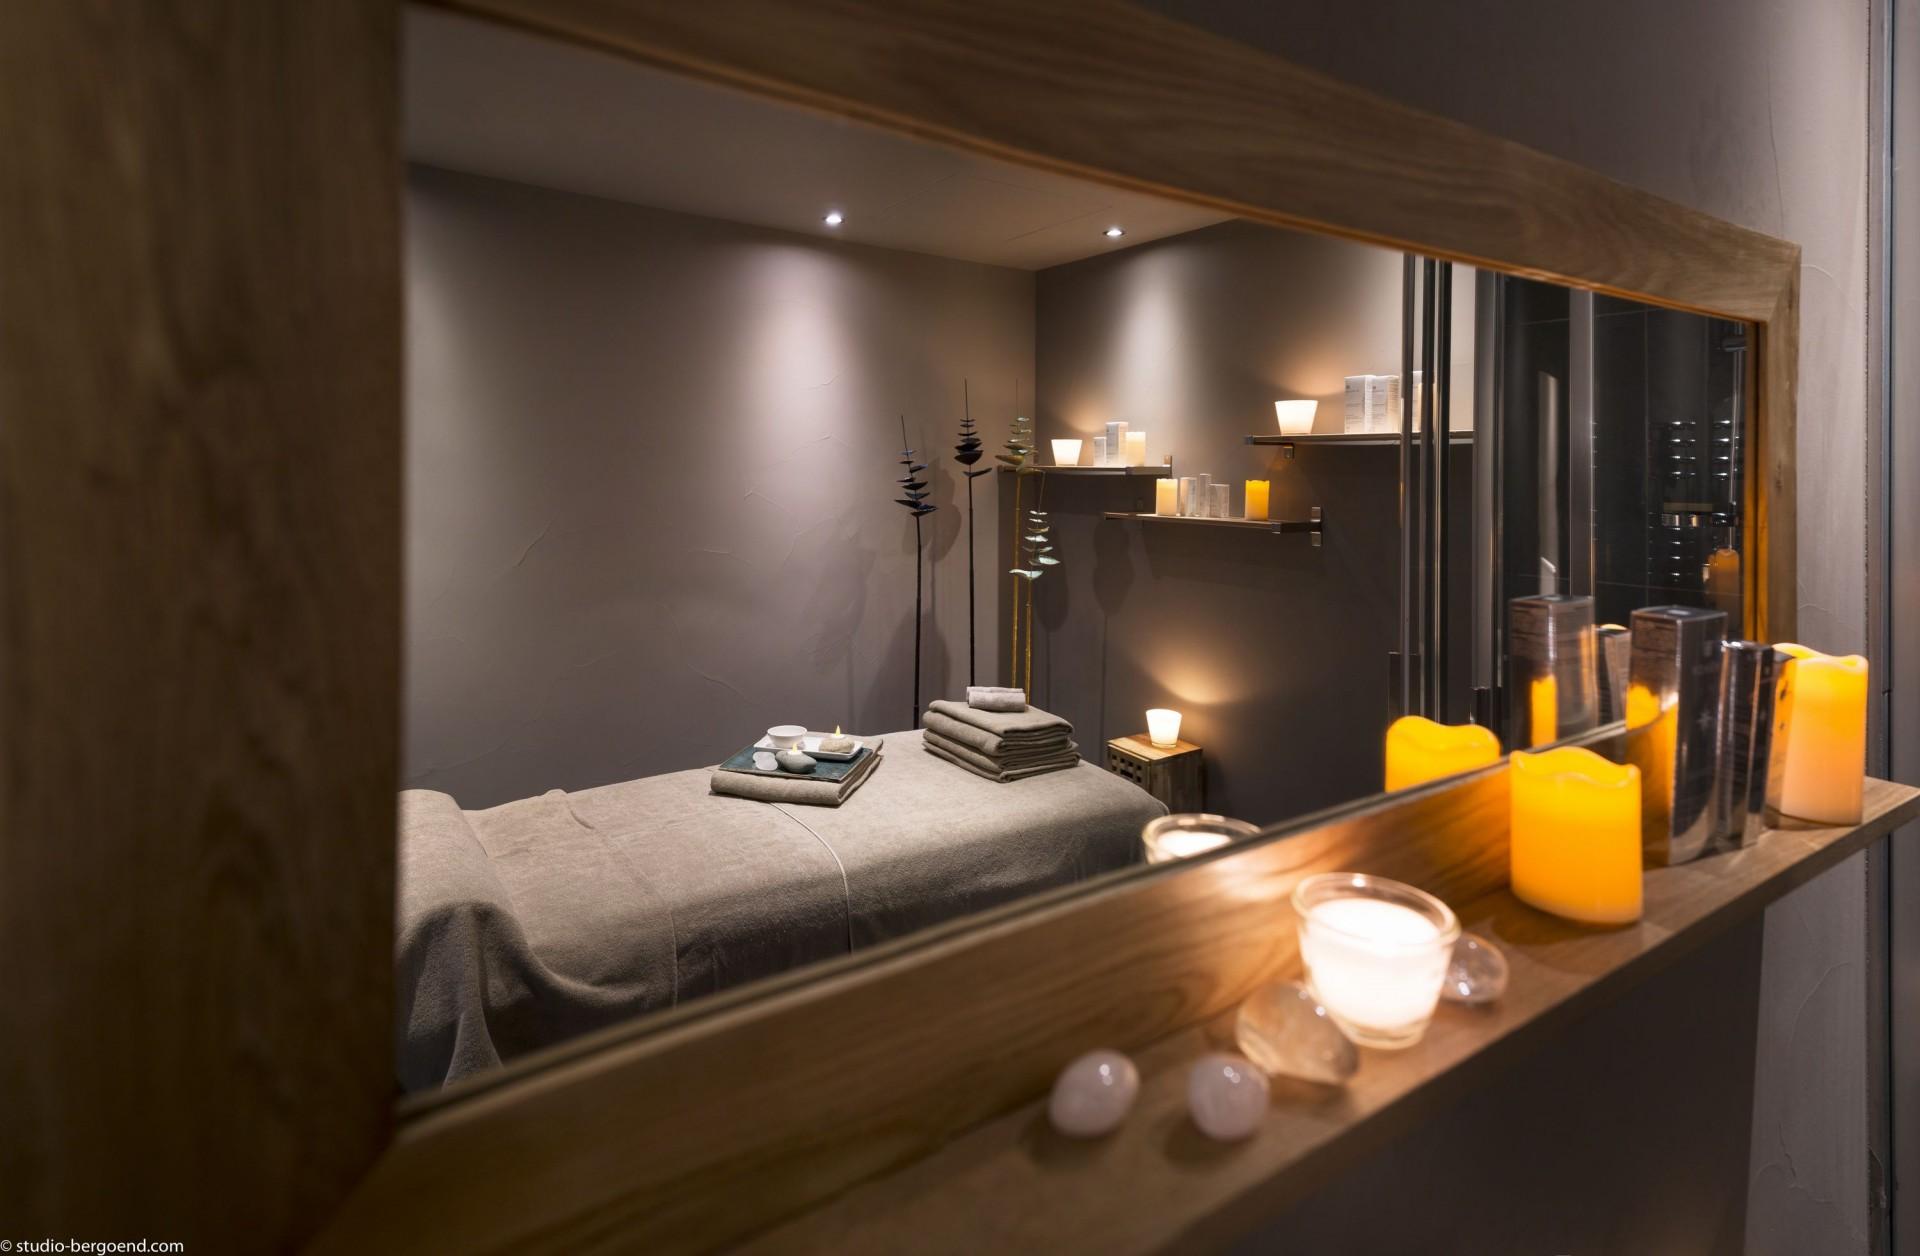 Tignes Location Appartement Luxe Kyaunite Massage